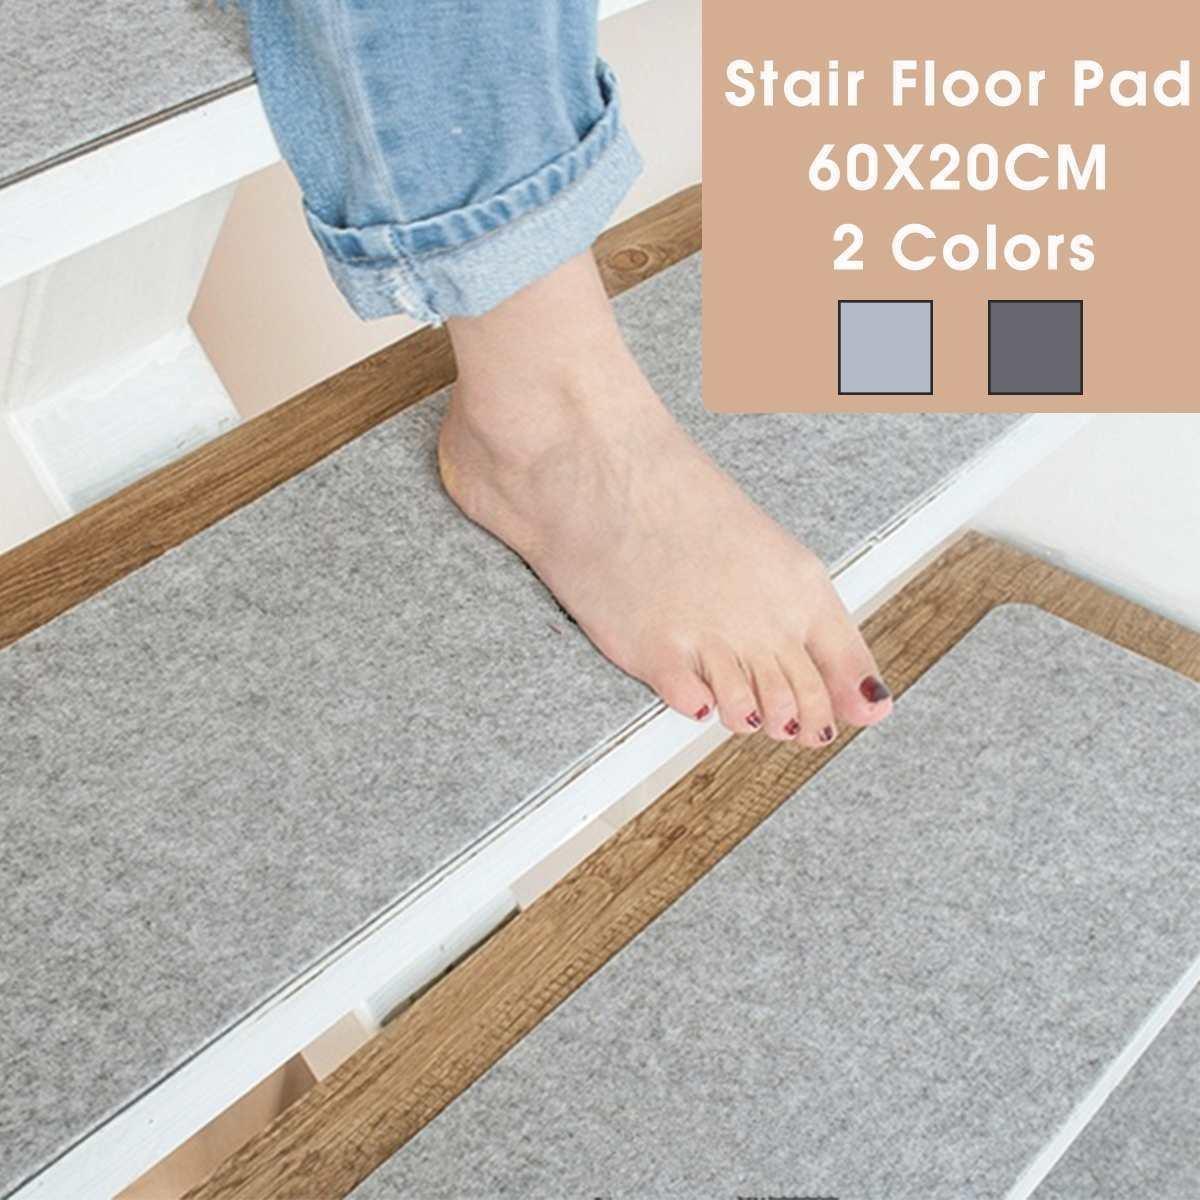 60X20Cm Non Slip Stair Carpet Mat Reusable Washable Diy Floor Mat | Stairway To Darkness Rug | Area | Tardis | 3 Dimensional | Floor | Scary